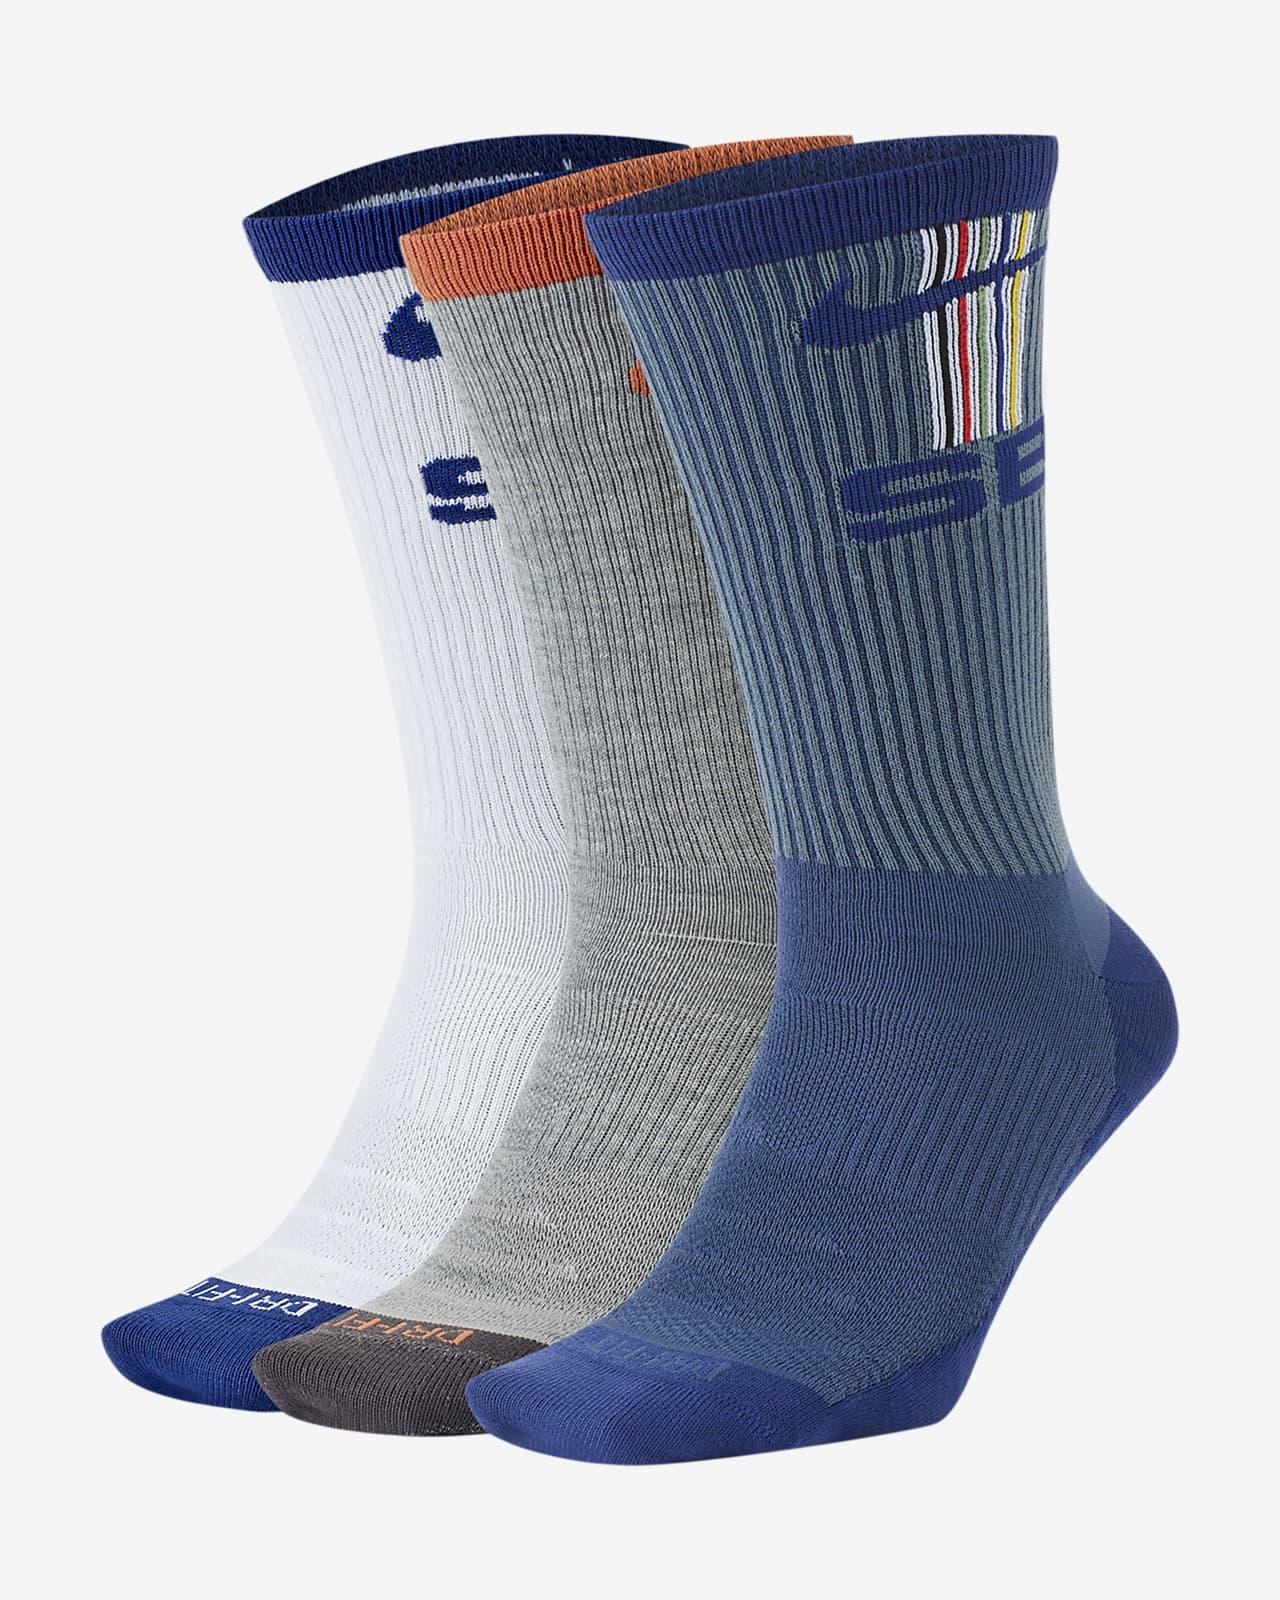 Nike SB Everyday Max Lightweight 滑板运动袜(3 双)